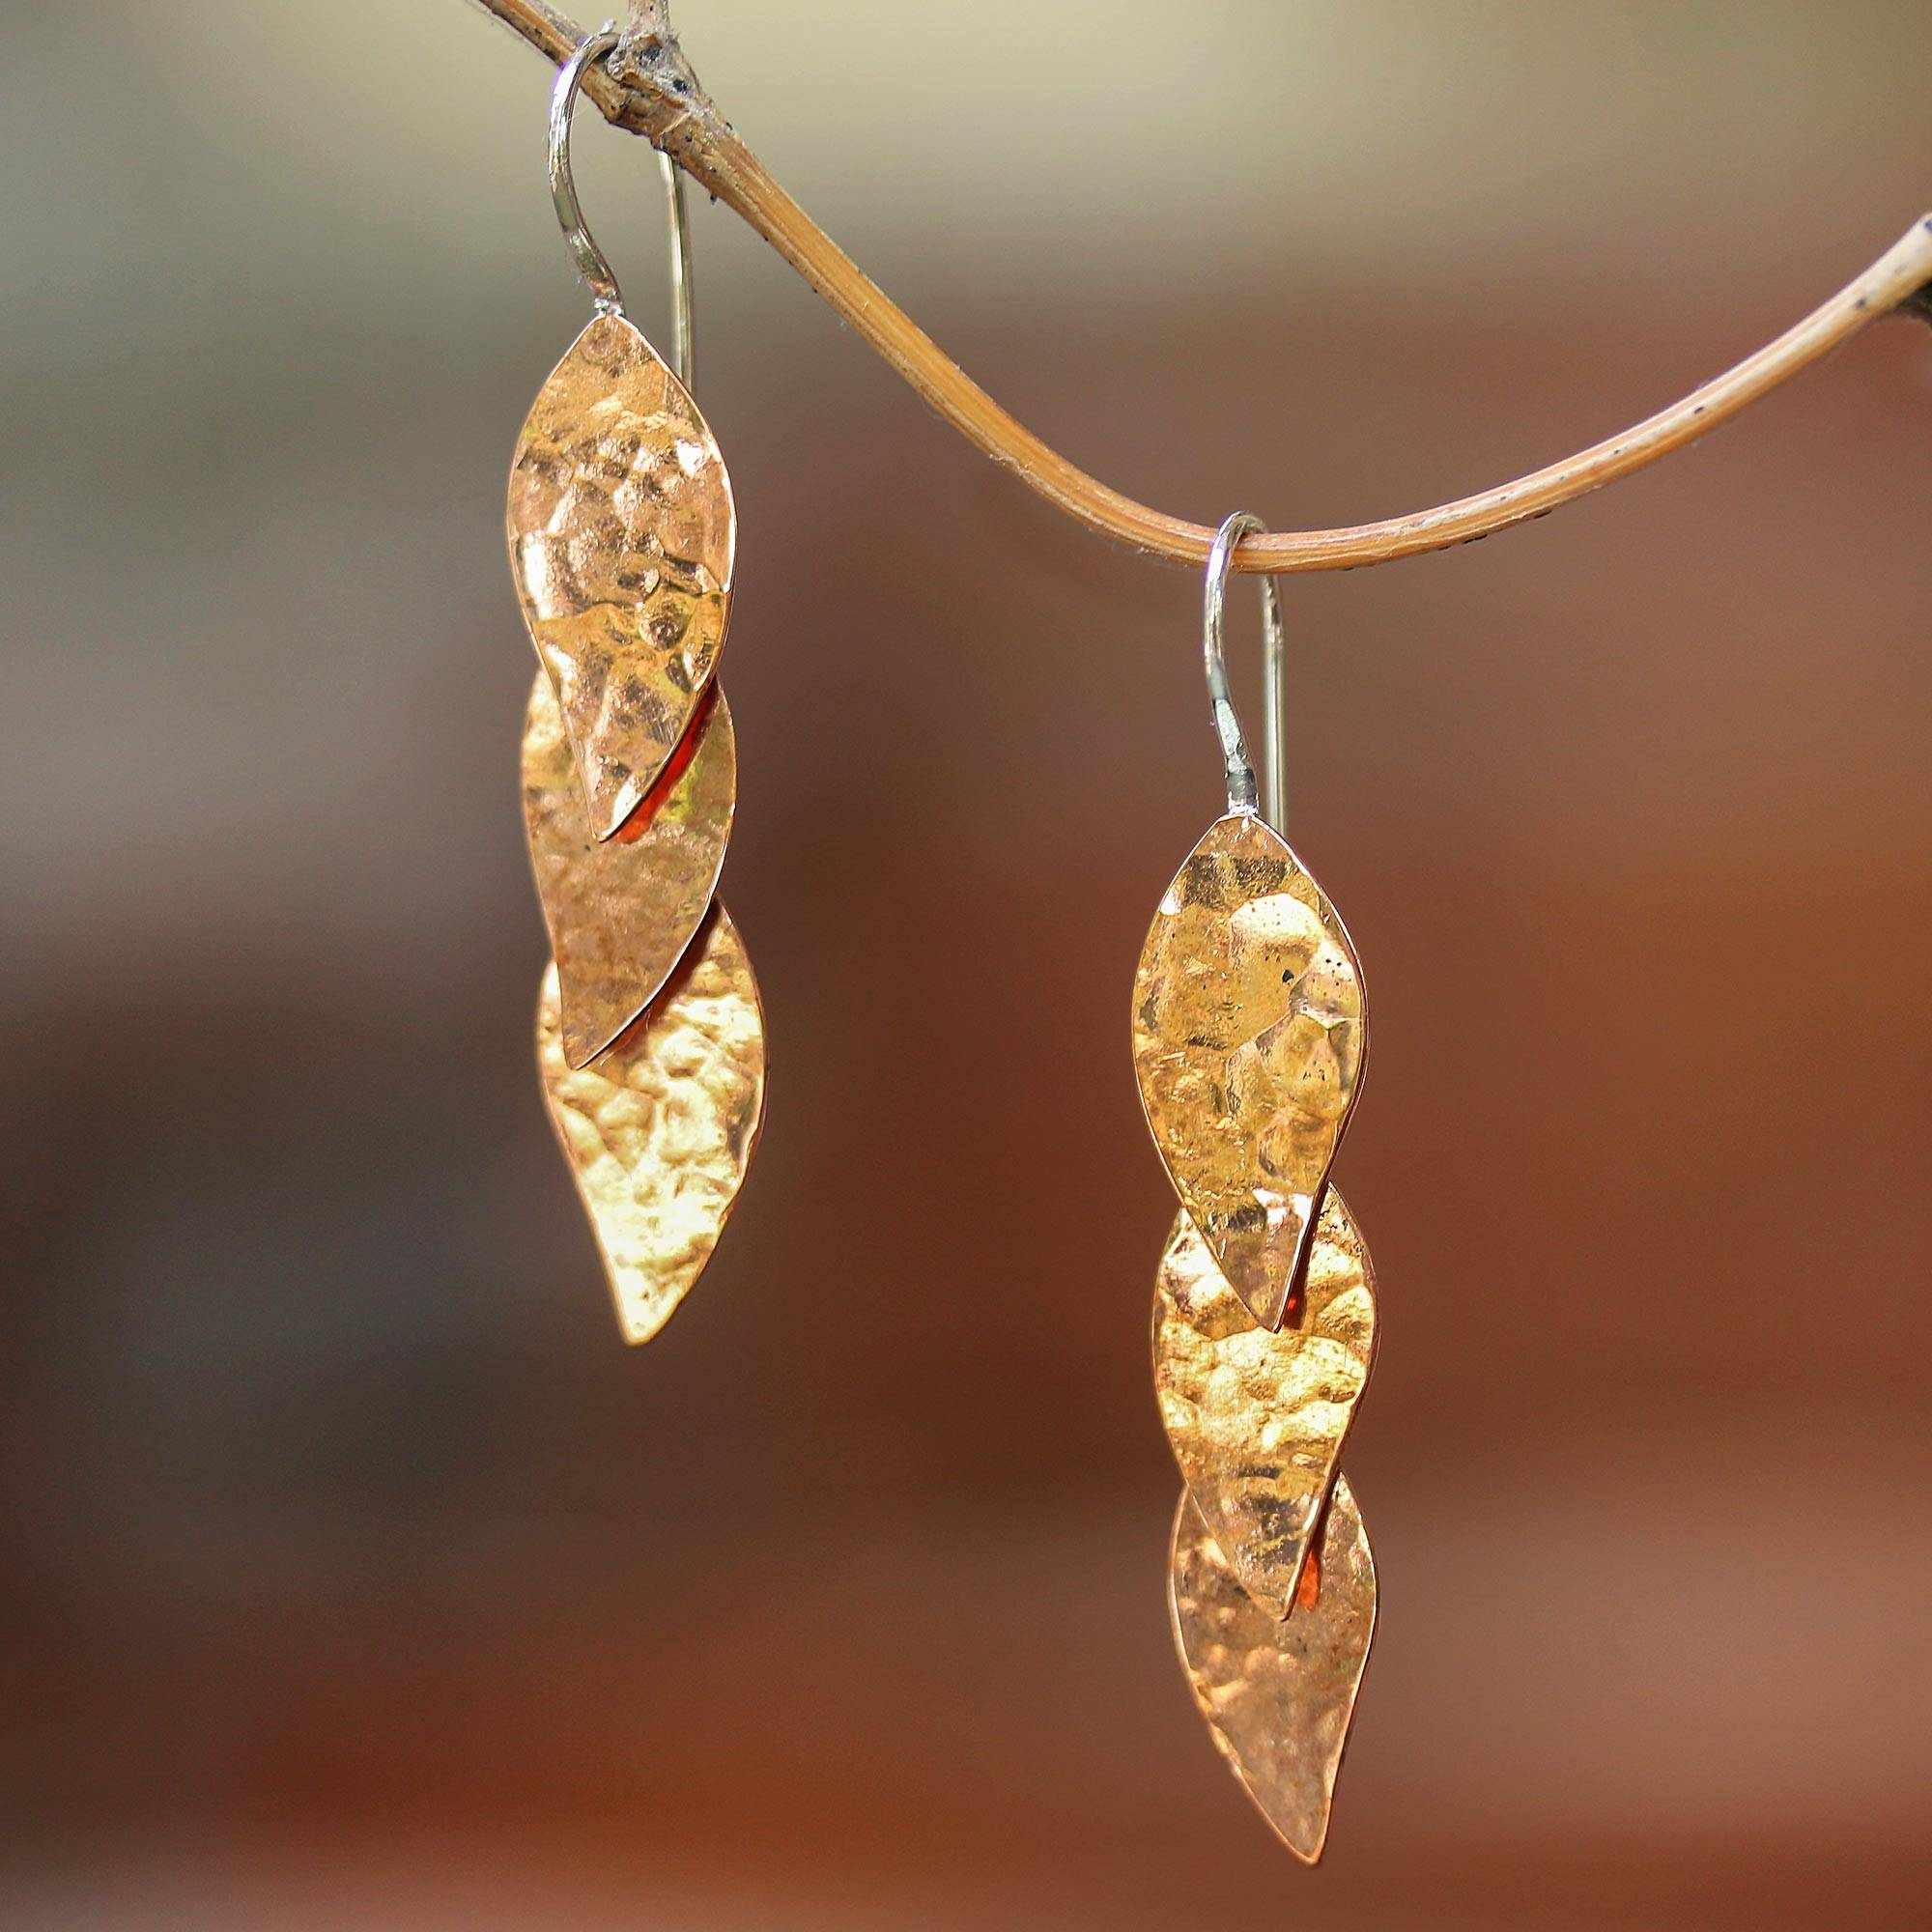 Dangle Earrings Handmade Long Metal Earrings Black Black Earrings Dangle,Copper Jewelry Handmade Hammered Copper Earrings